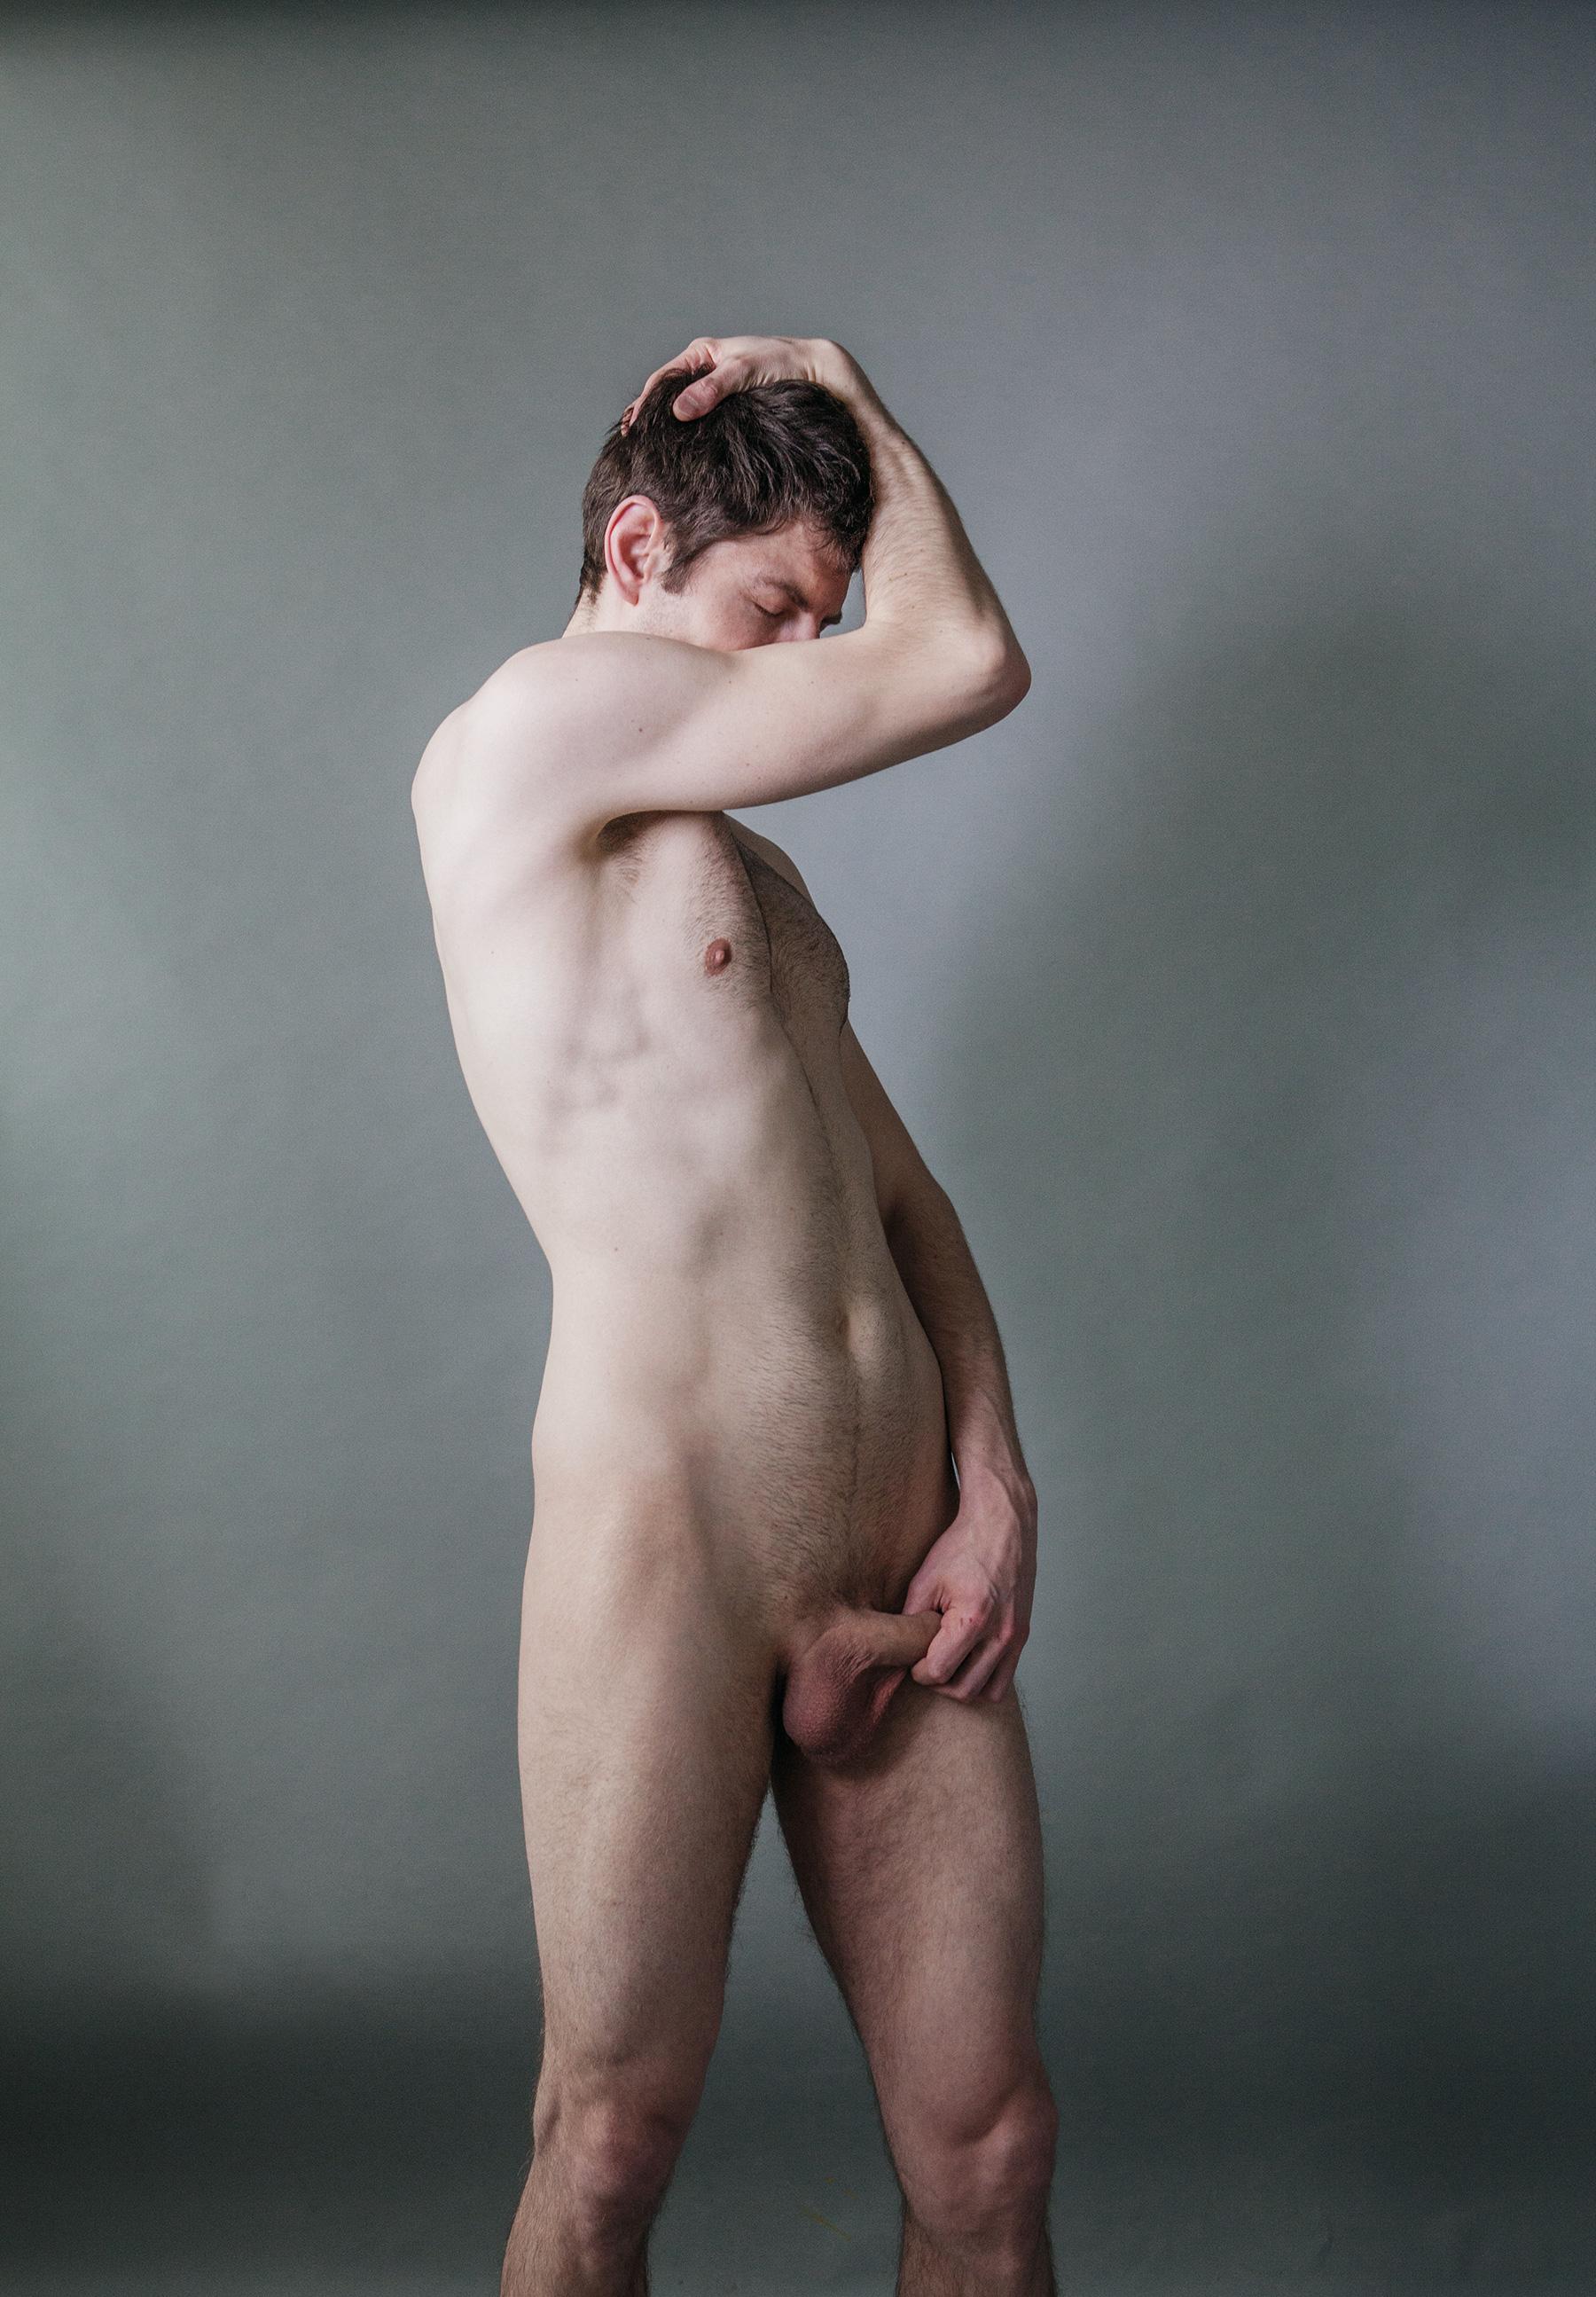 Nude-man.jpg